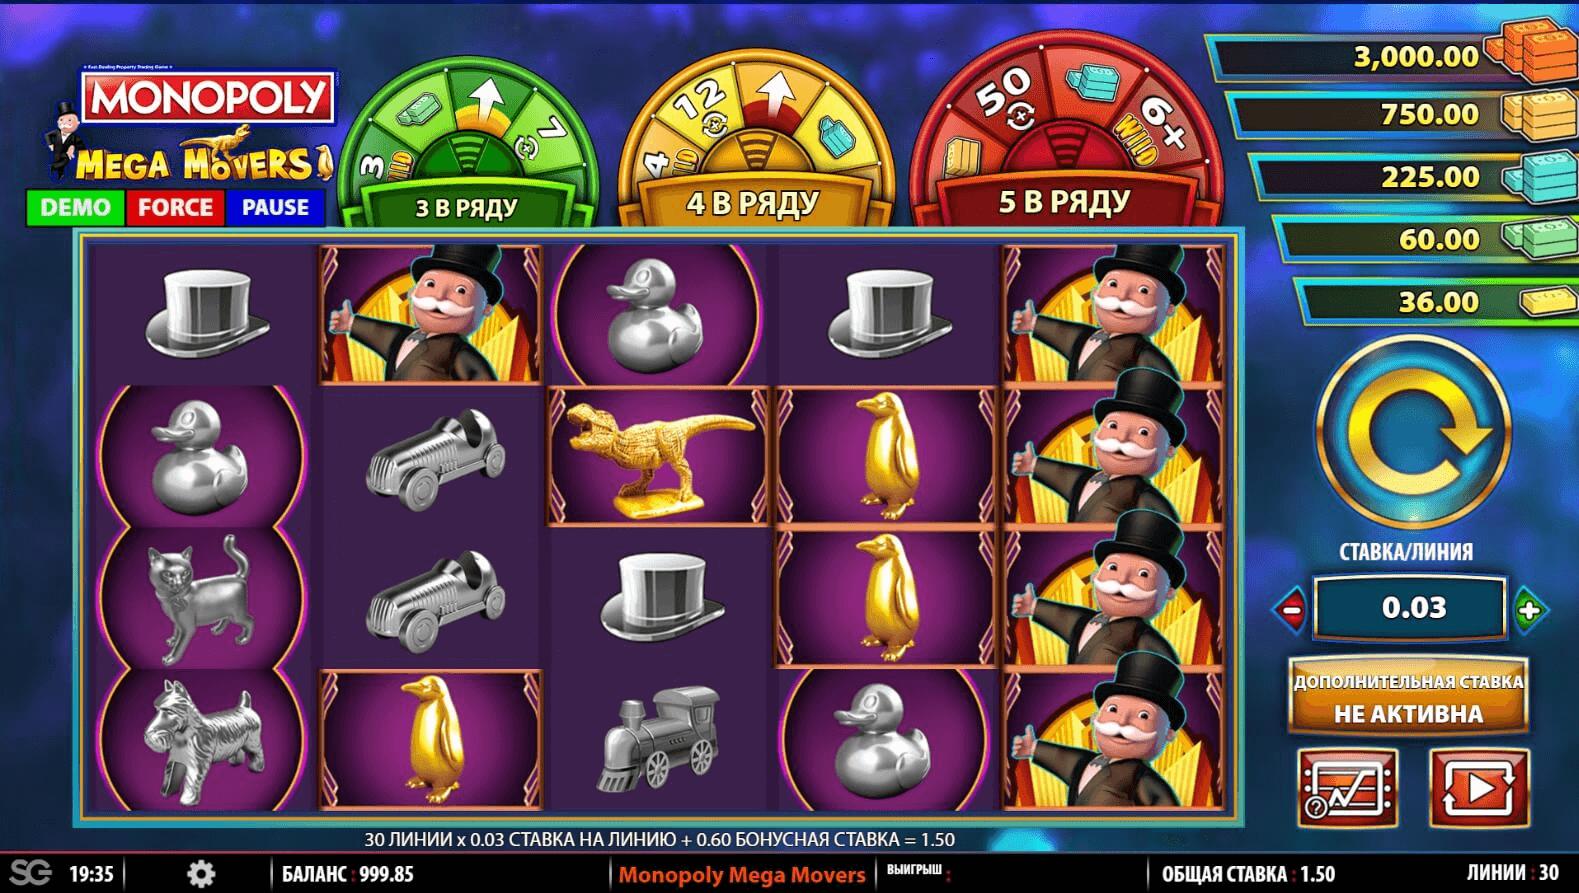 Monopoly Mega Movers slot machine screenshot